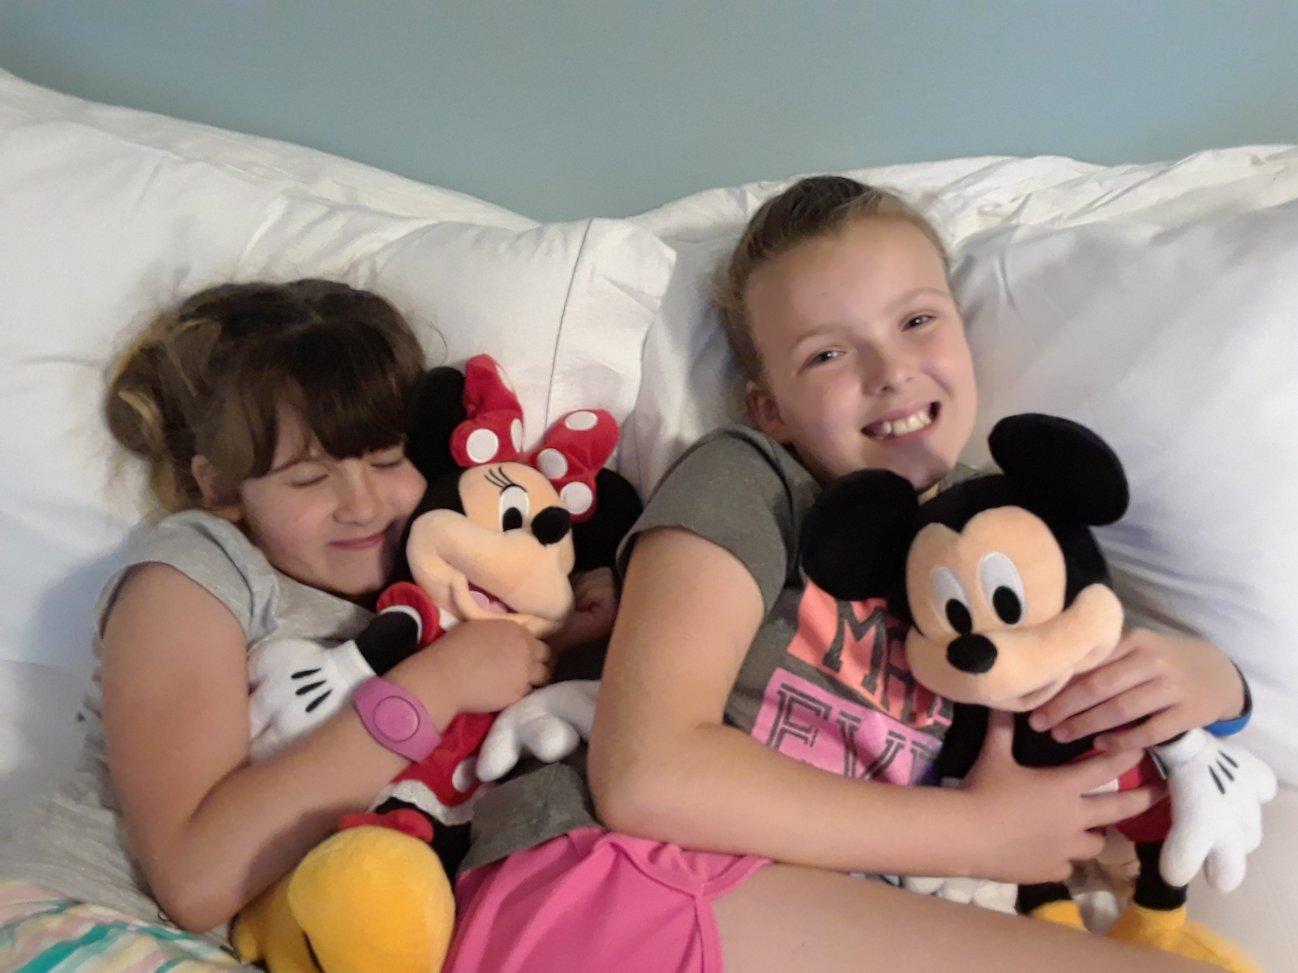 Foley Girls with Mickey and Minnie.jpg